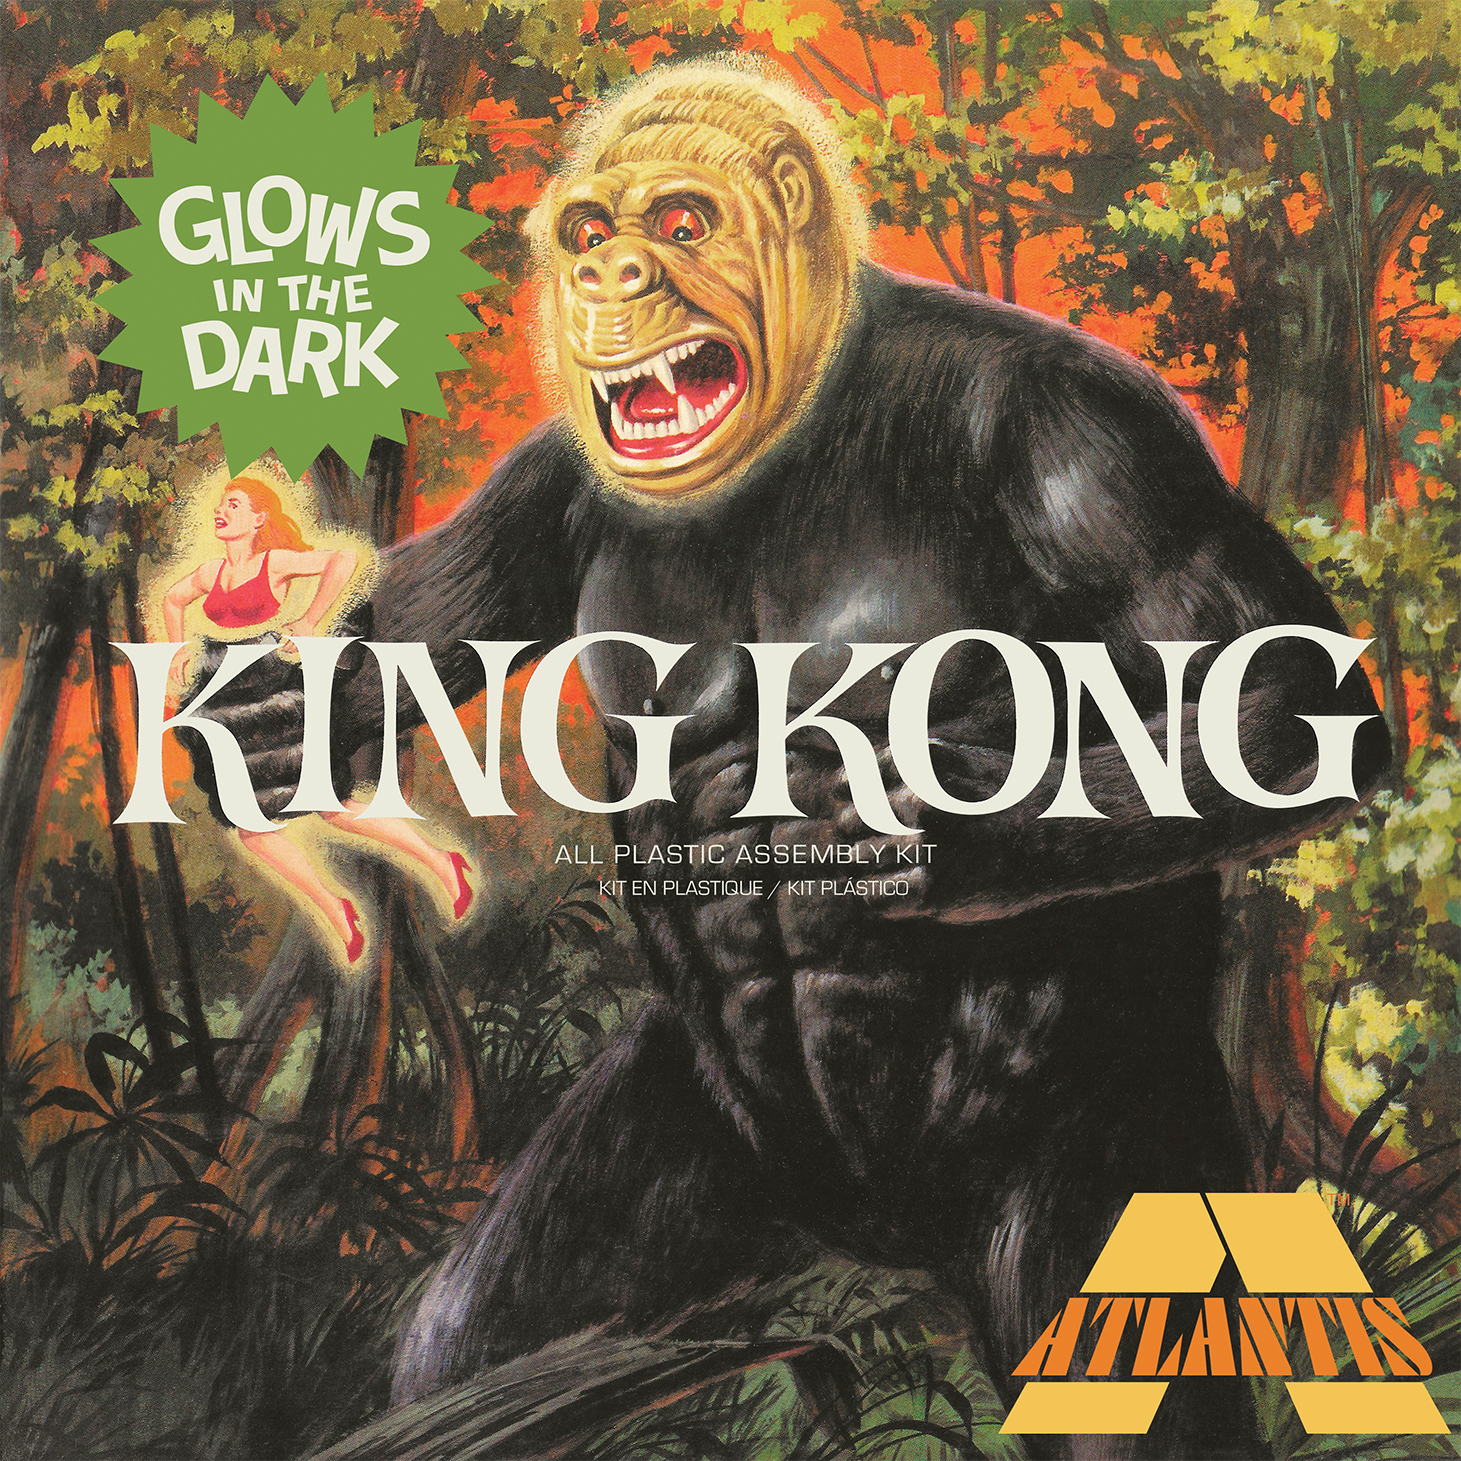 Atlantis 1/30 King Kong Glow Edition